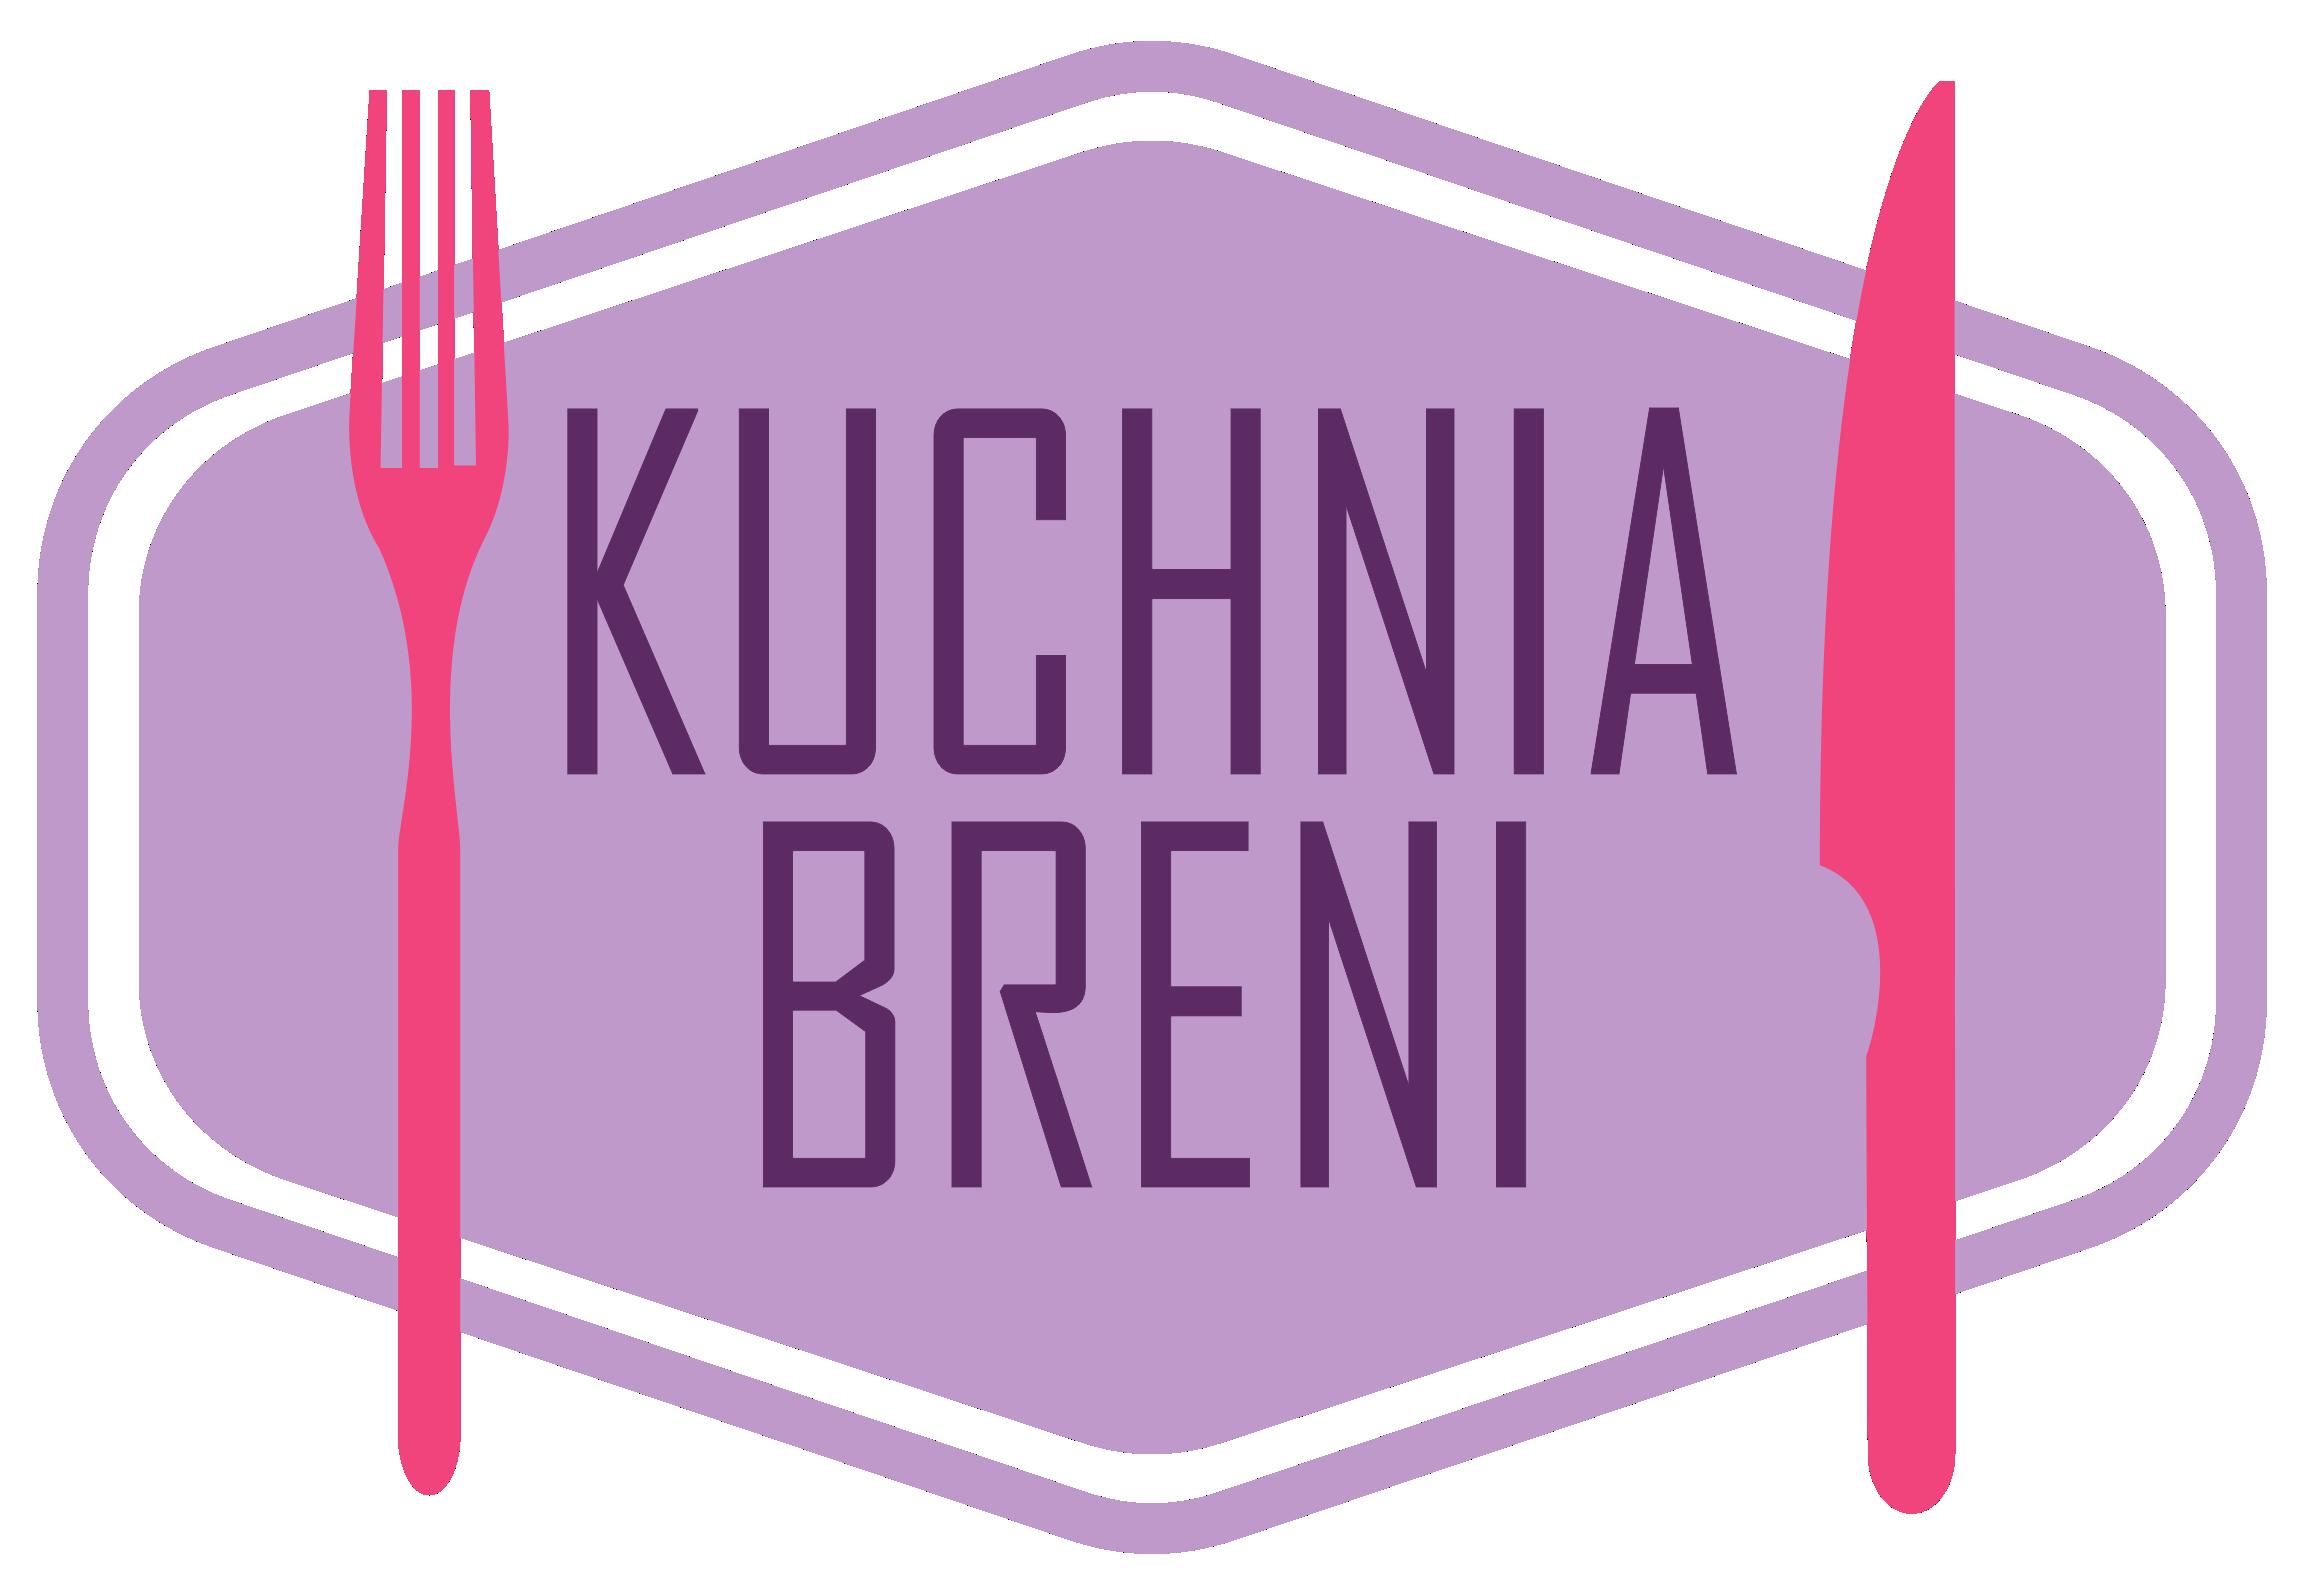 Kuchnia Breni